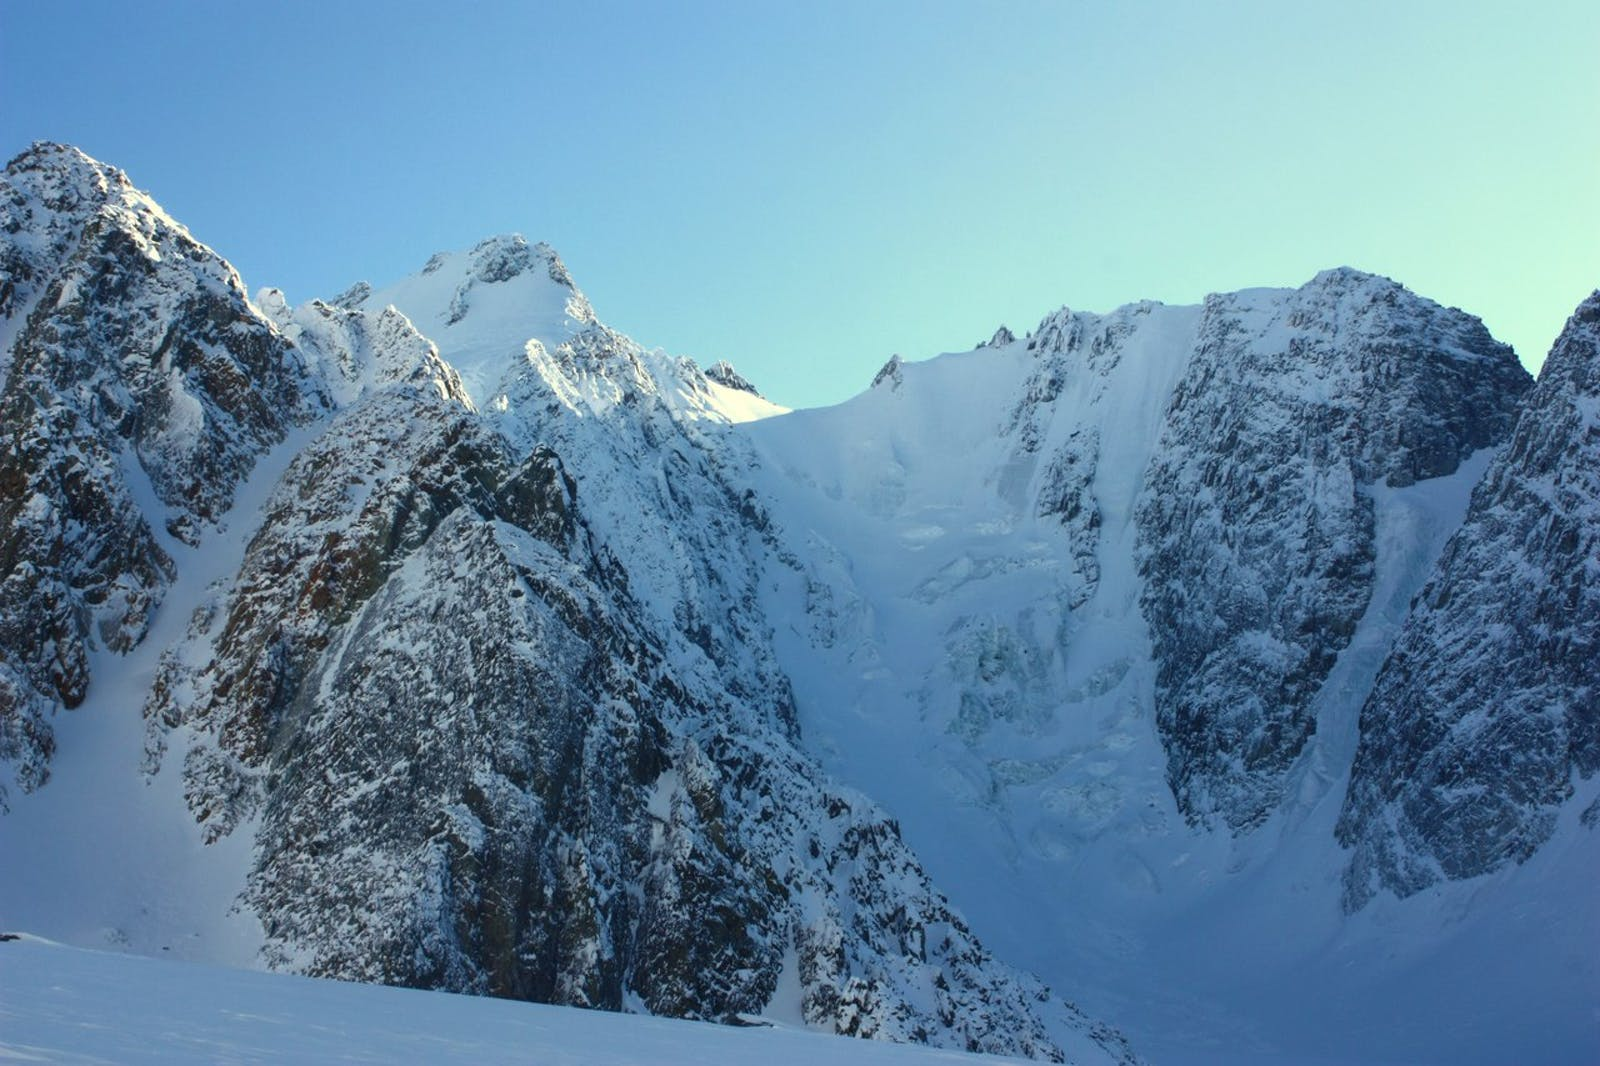 Cherskii-Kolyma Mountain Tundra